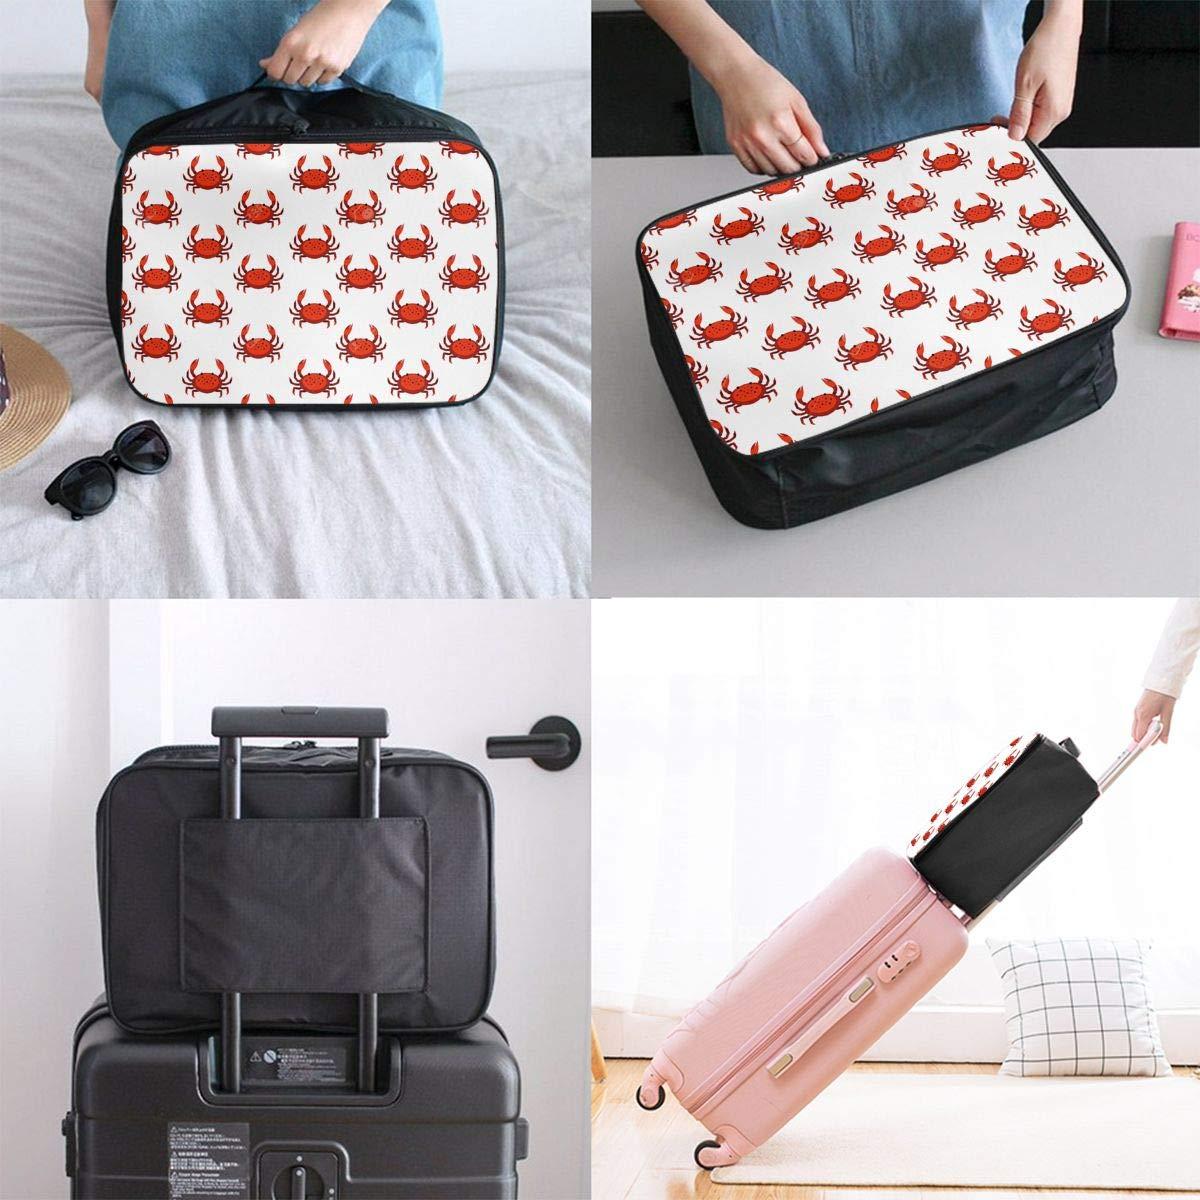 Travel Luggage Duffle Bag Lightweight Portable Handbag Red Crab Pattern Large Capacity Waterproof Foldable Storage Tote